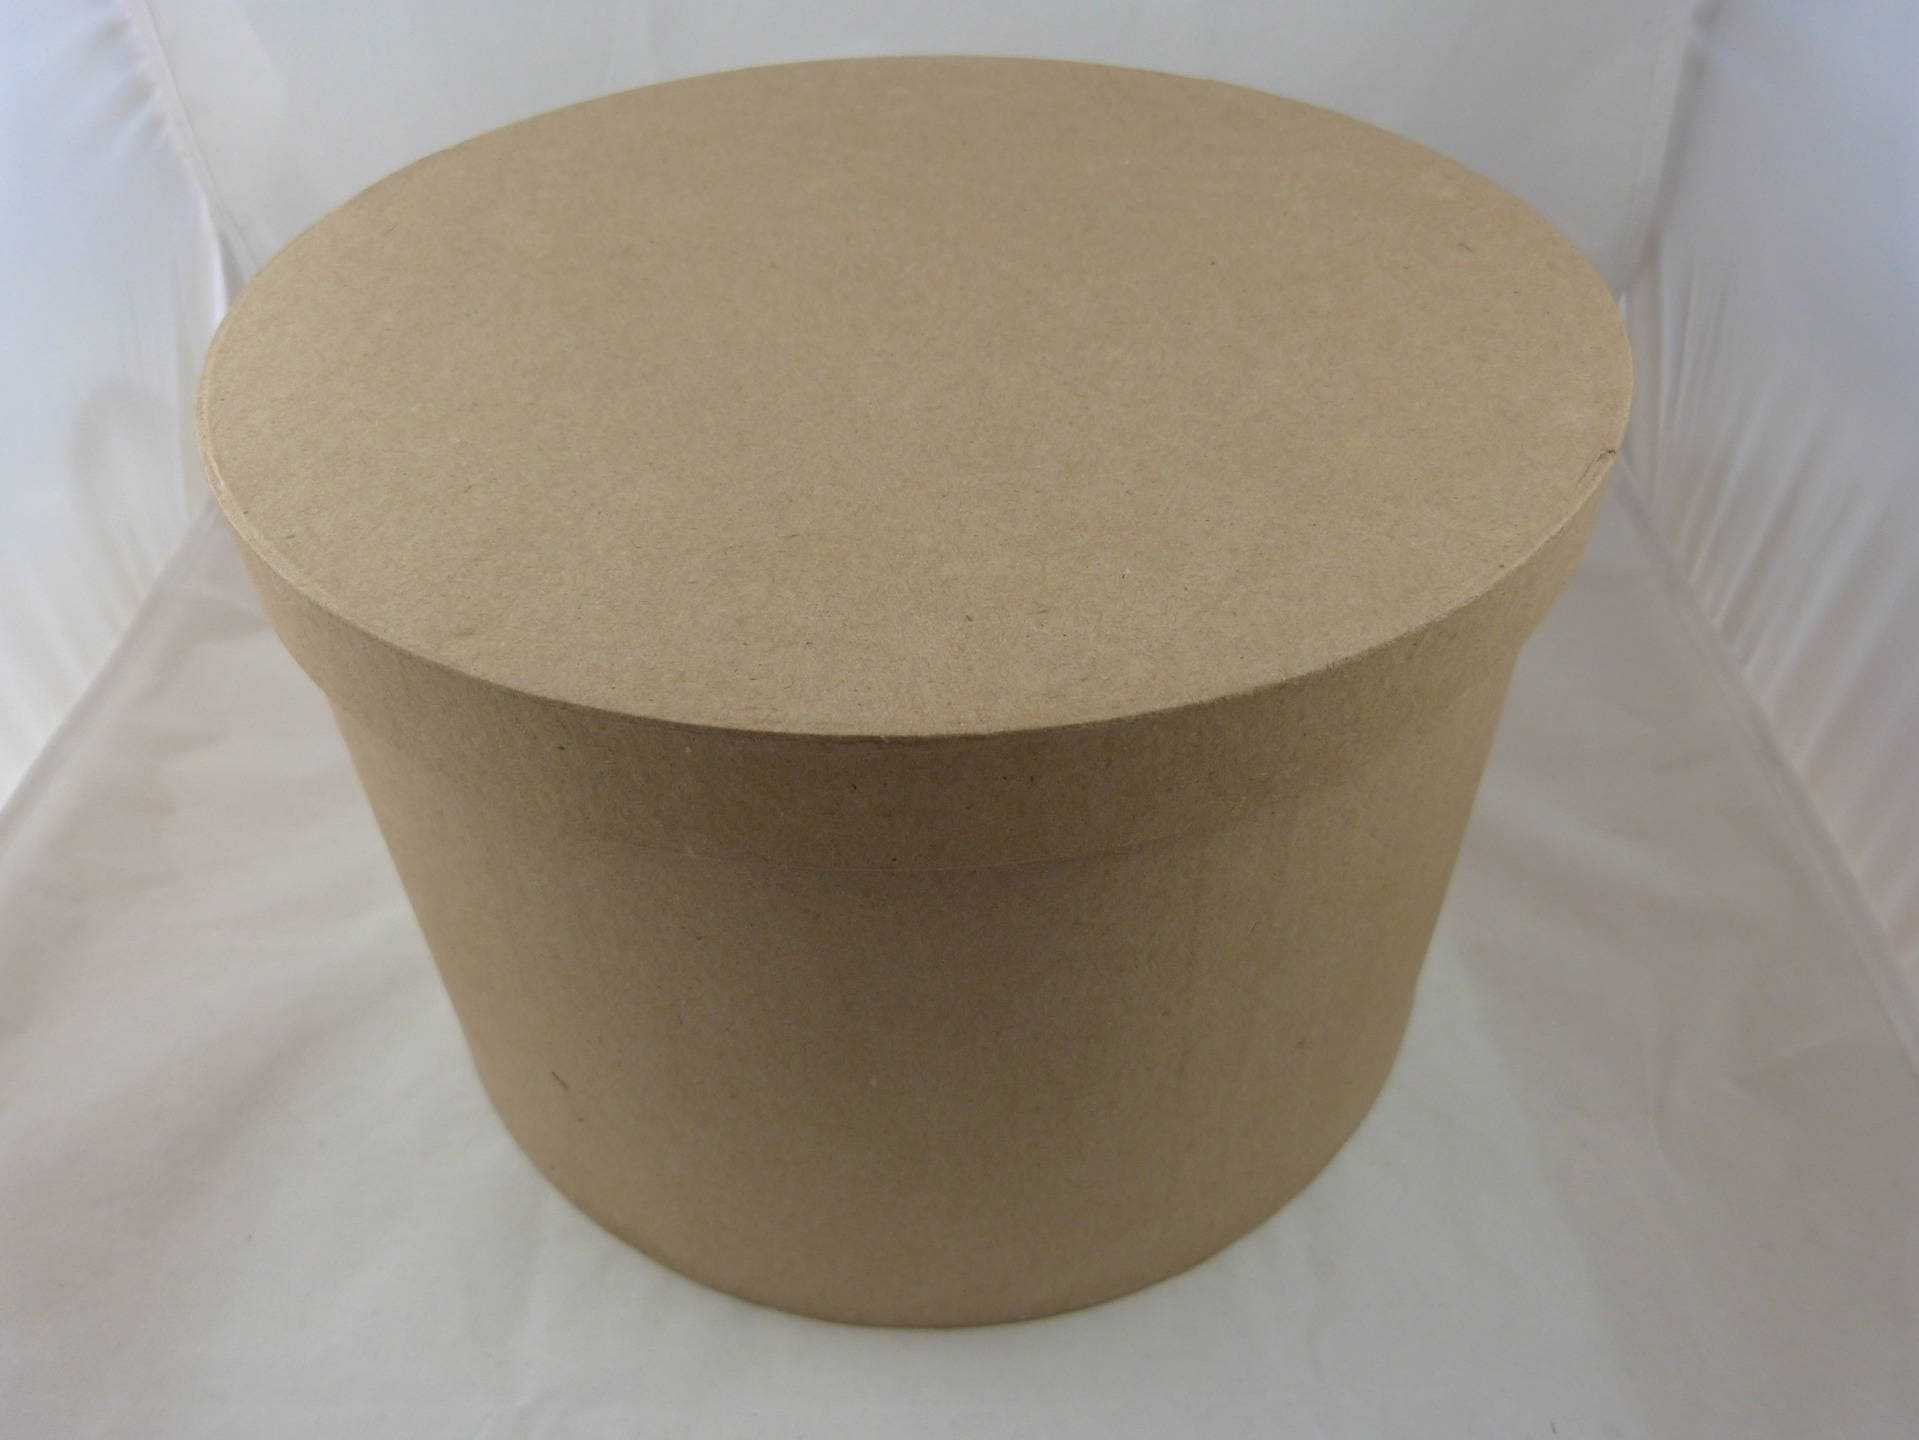 grande boite ronde en carton d corer. Black Bedroom Furniture Sets. Home Design Ideas